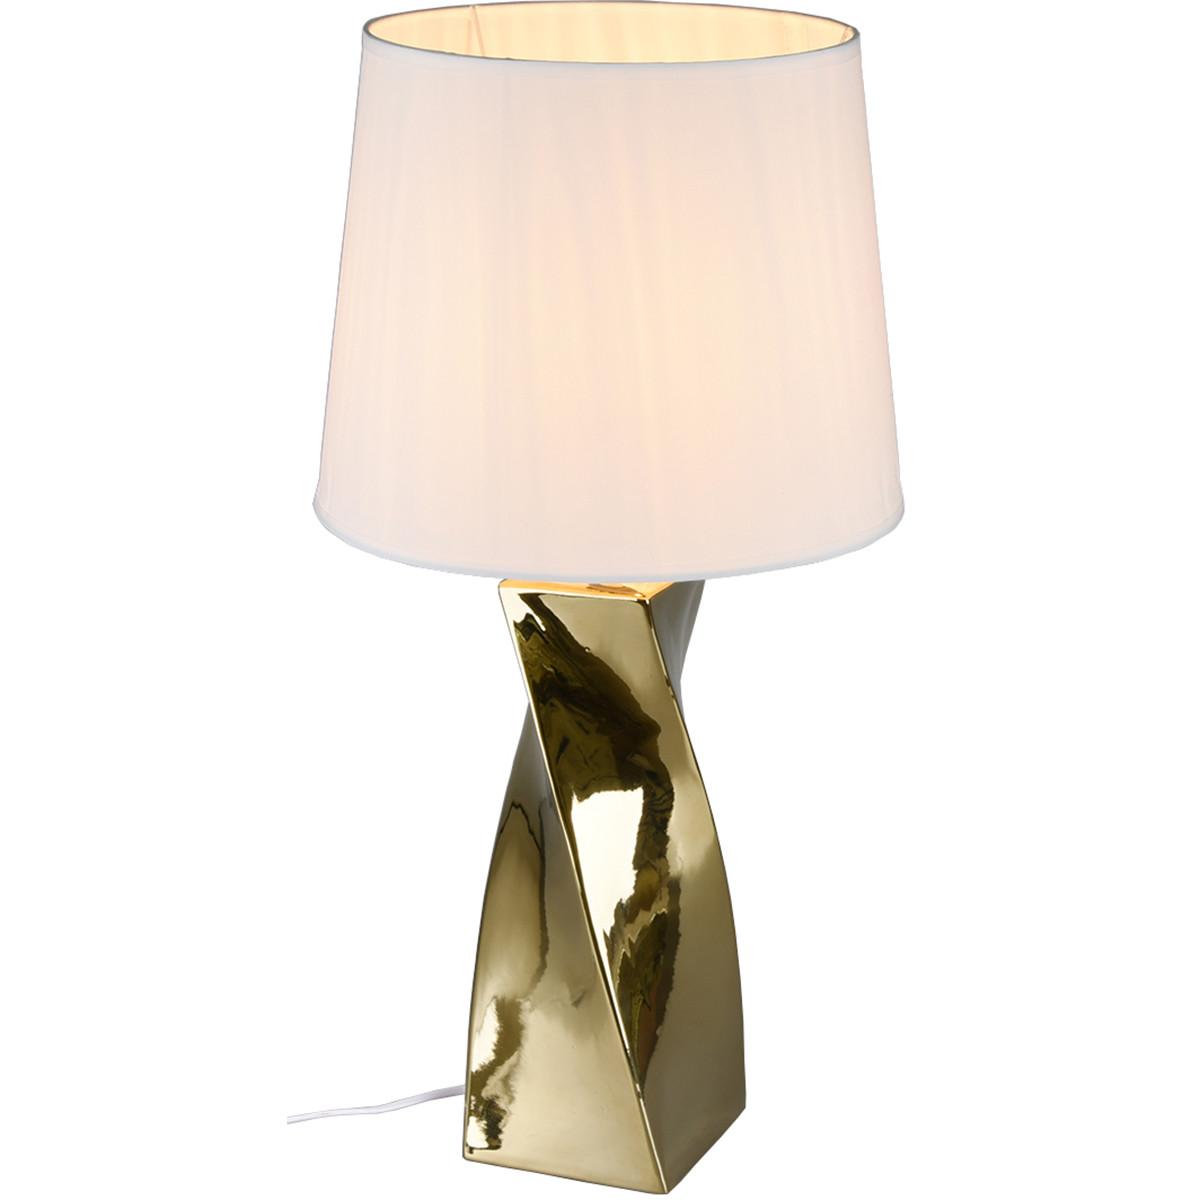 LED Tafellamp - Trion Aneby - E27 Fitting - Rond - Glans Goud - Keramiek/Textiel